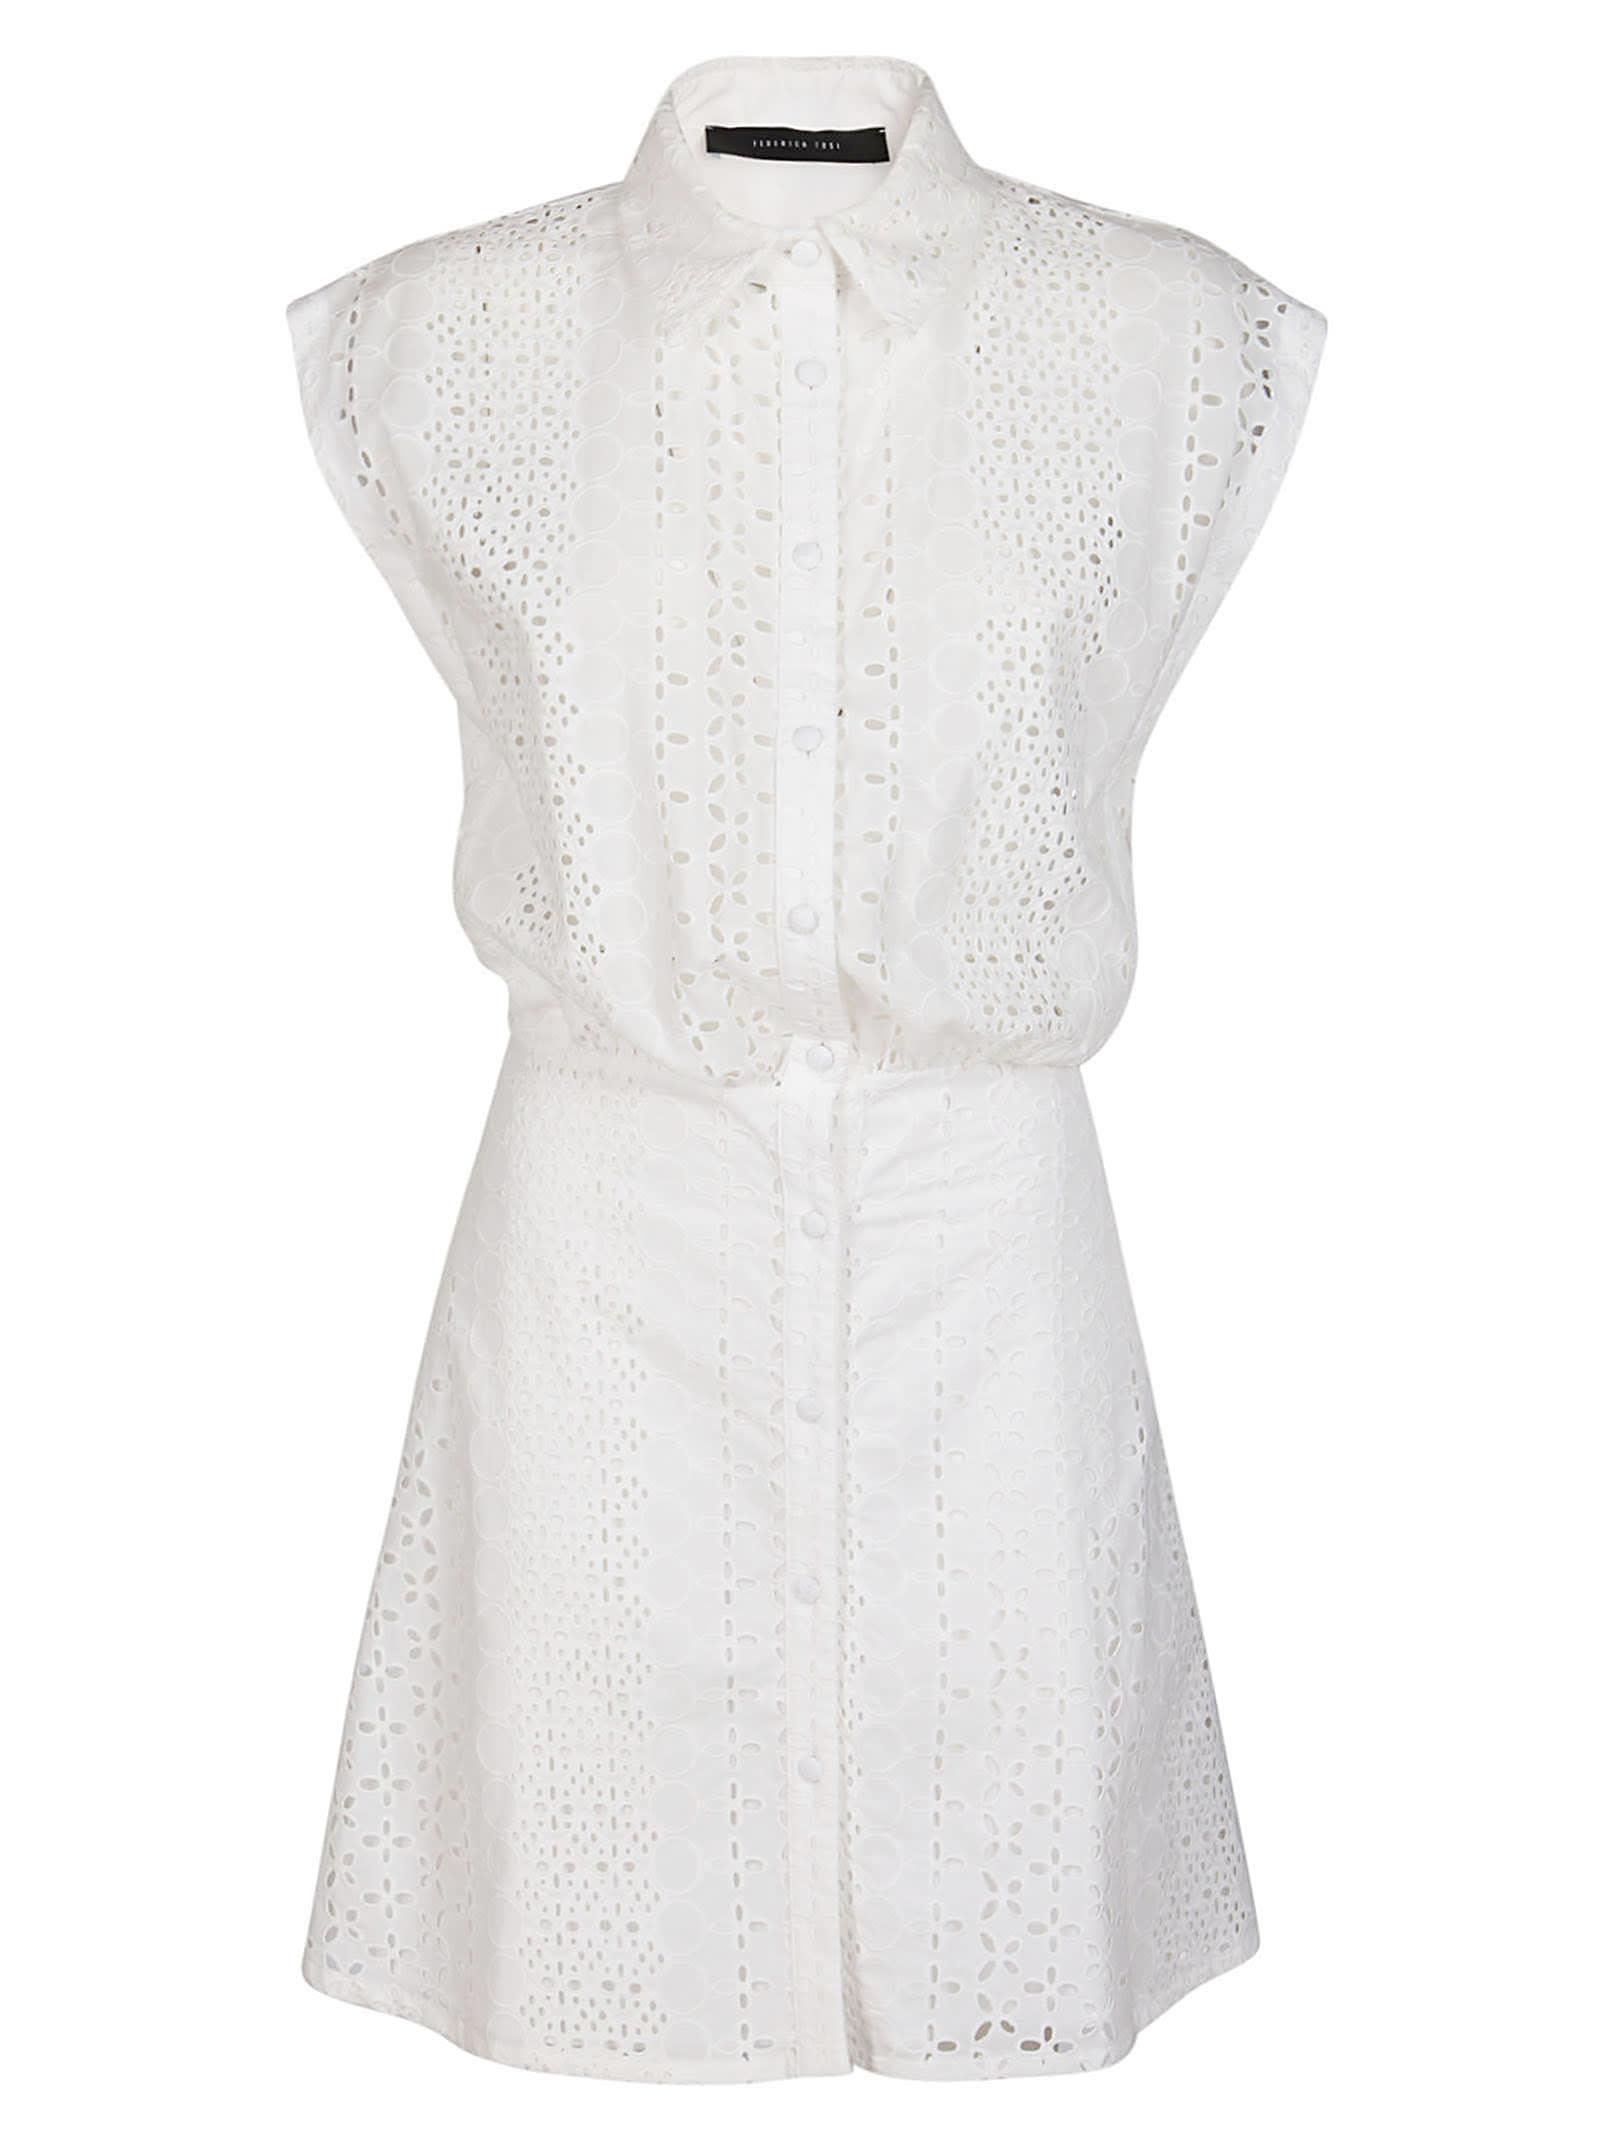 Federica Tosi WHITE COTTON DRESS